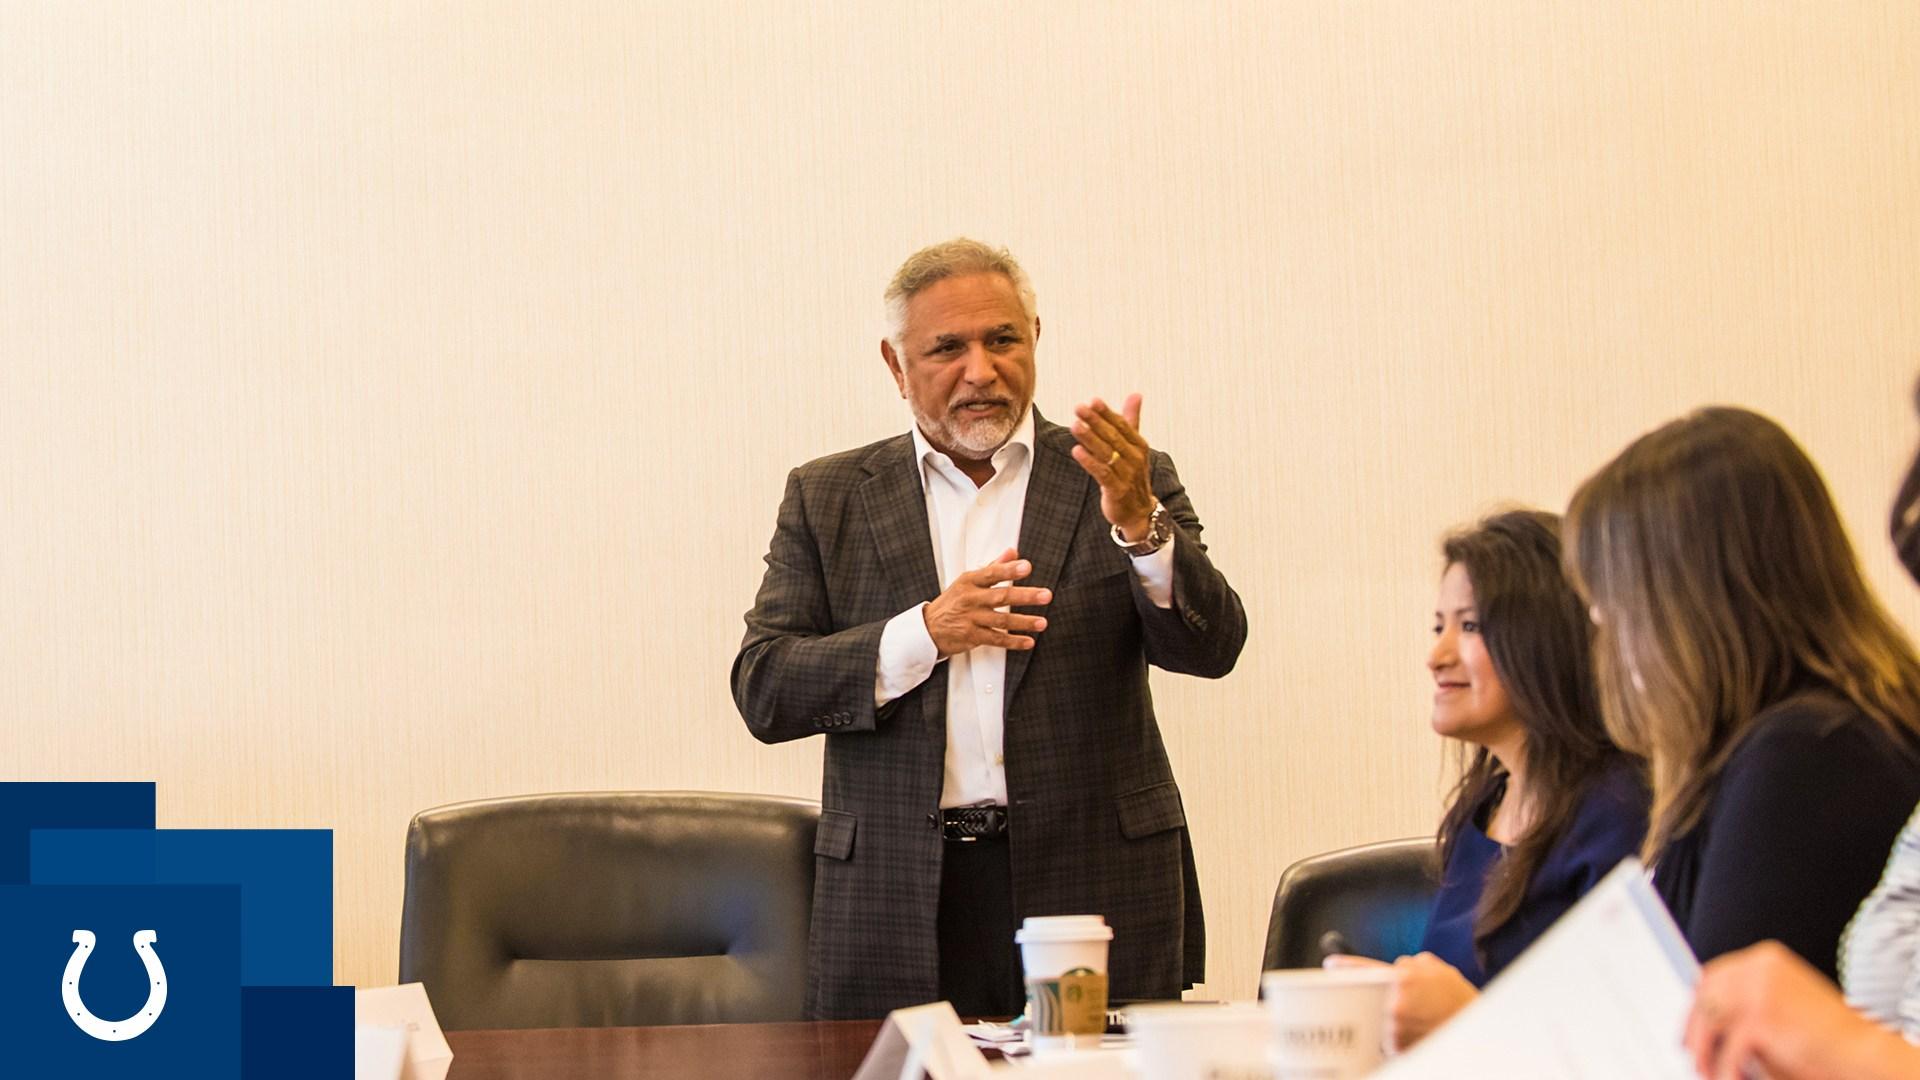 Charlie Garcia – 2019 Hispanic Heritage Leadership Award Winner